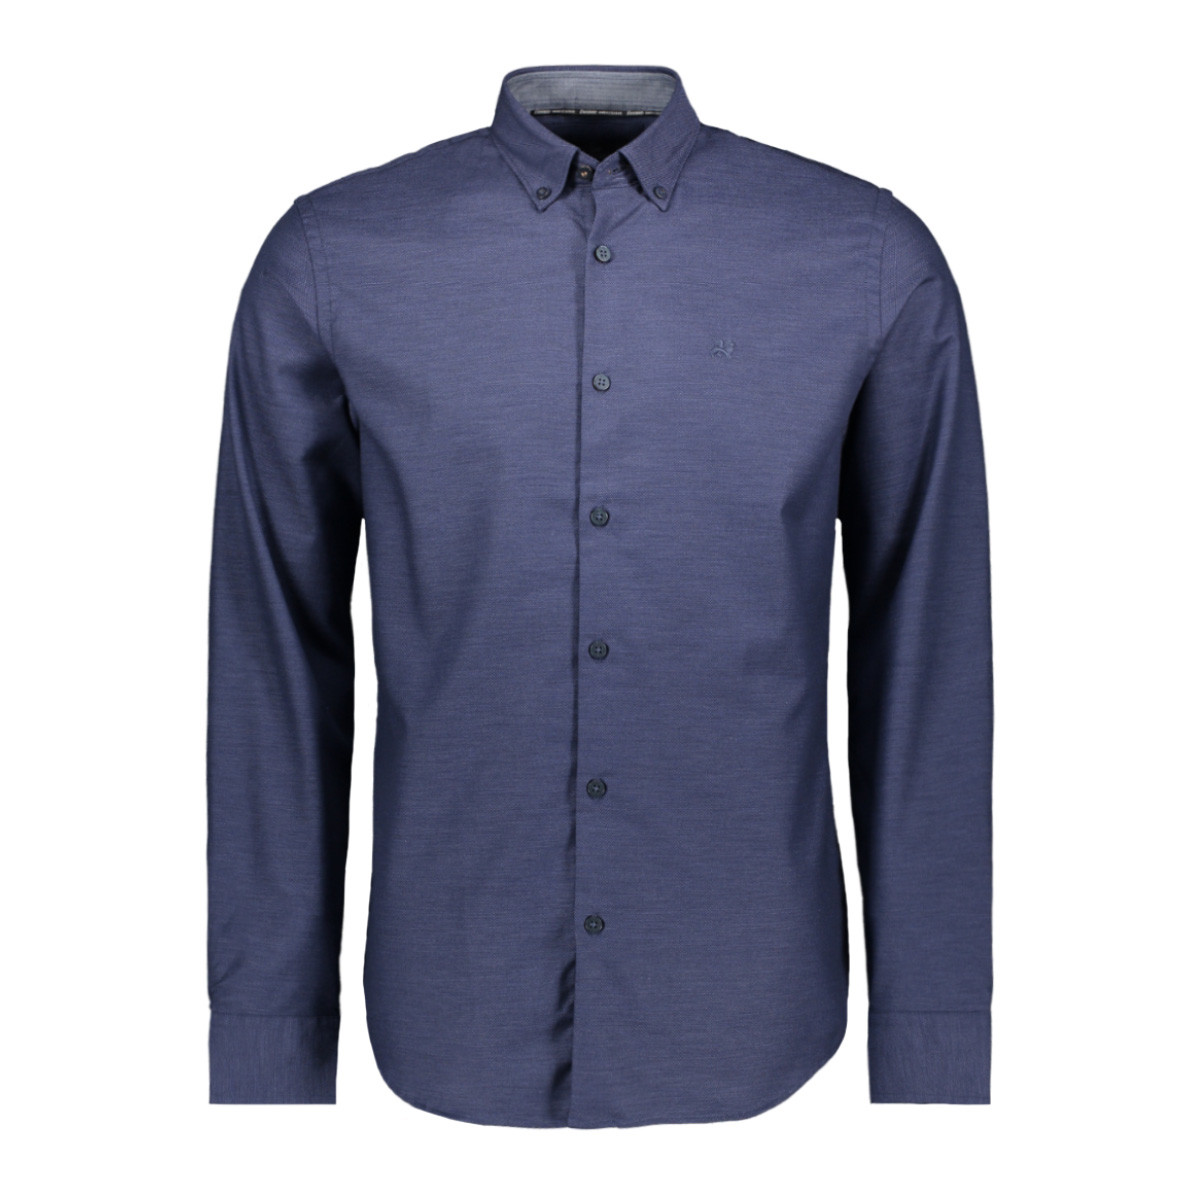 Blauw heren overhemd Vanguard - VSI196434 5286